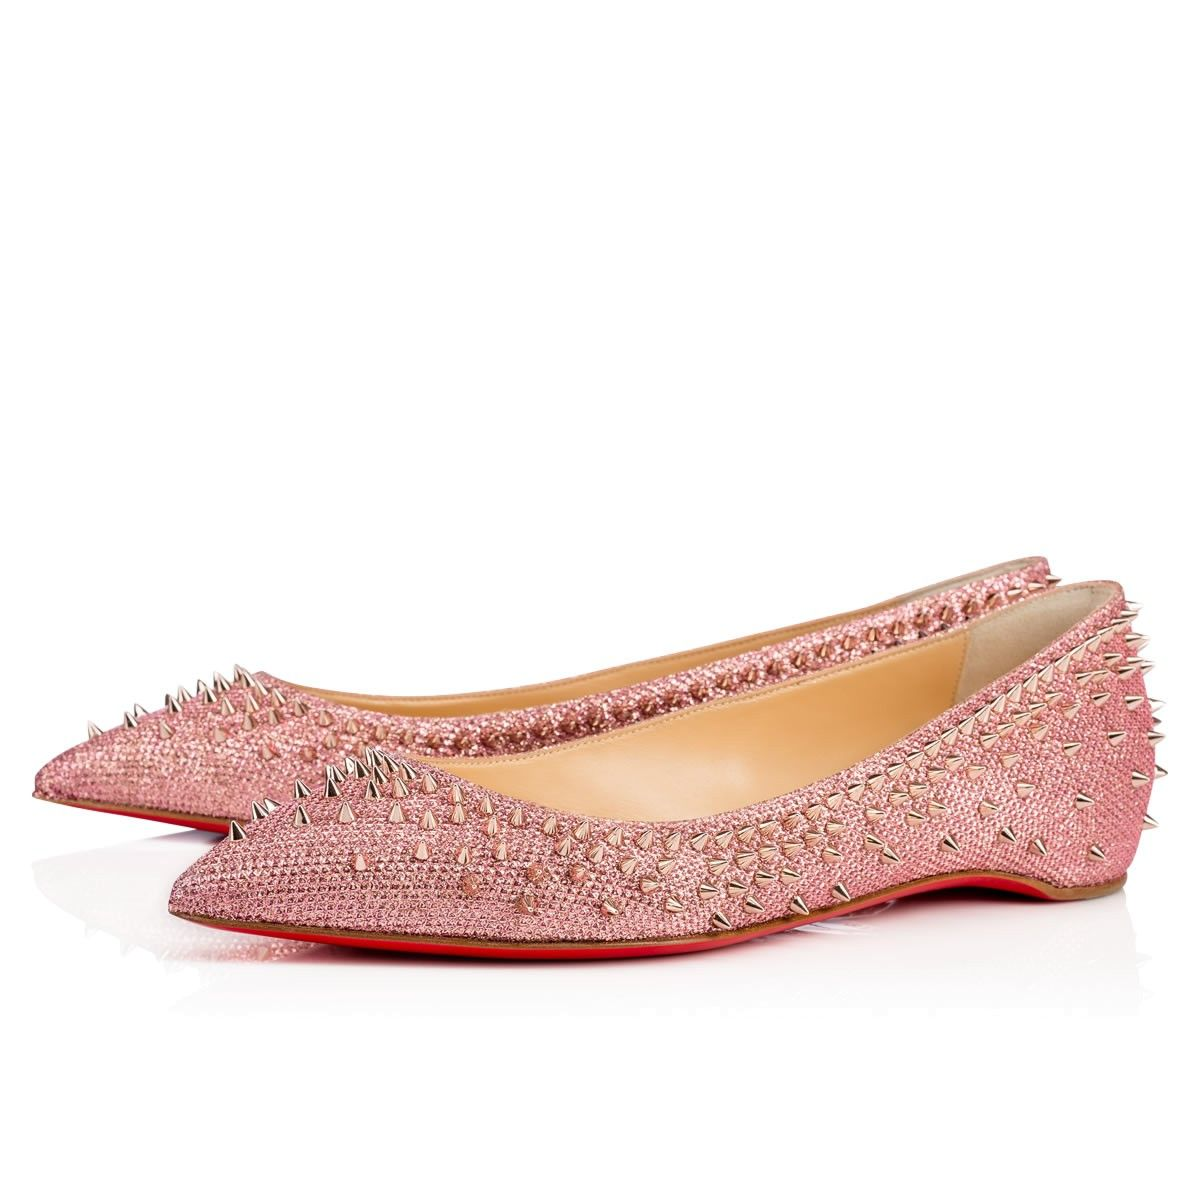 657b062587f4 CHRISTIAN LOUBOUTIN Escarpic Flat Poudre Pink Bronze Glitter - Women Shoes  - Christian Louboutin.  christianlouboutin  shoes